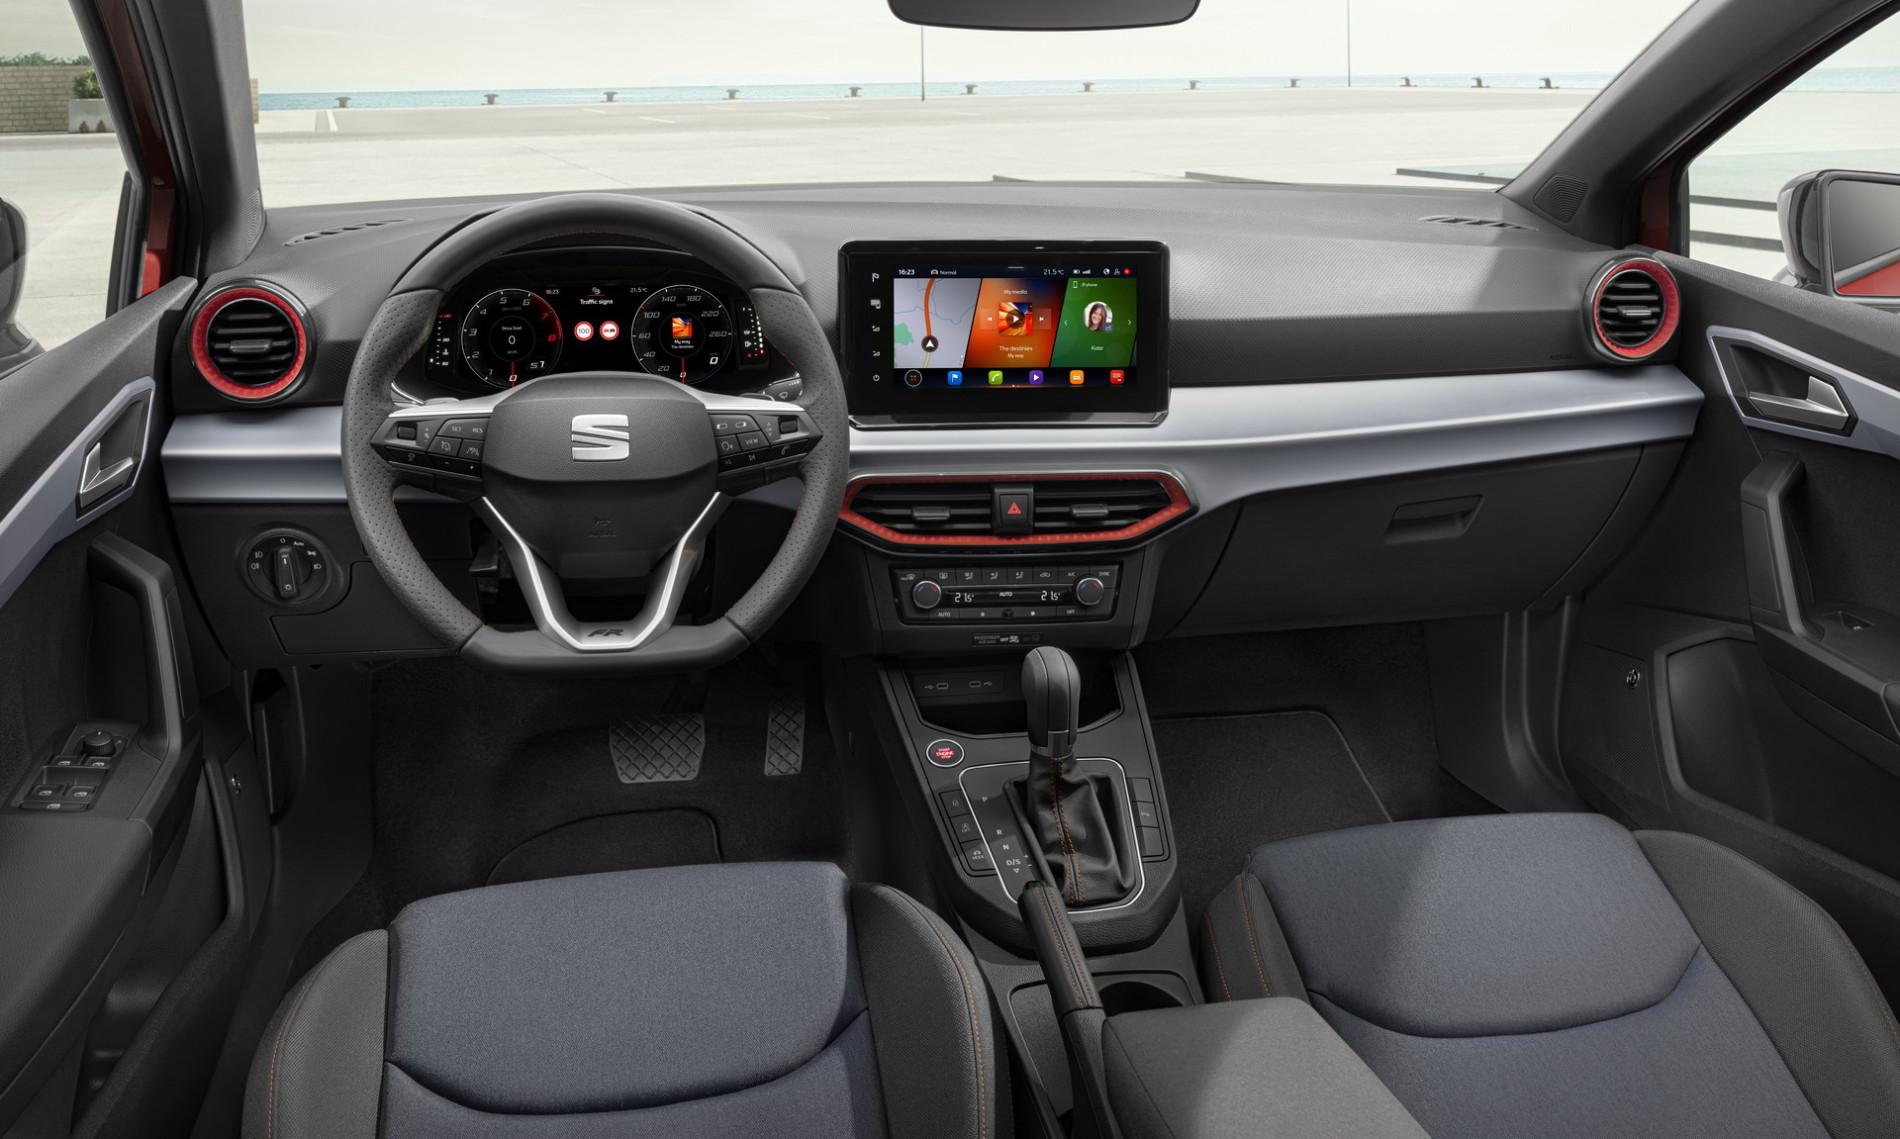 SEAT Ibiza Facelift - SEAT Ibiza Facelift